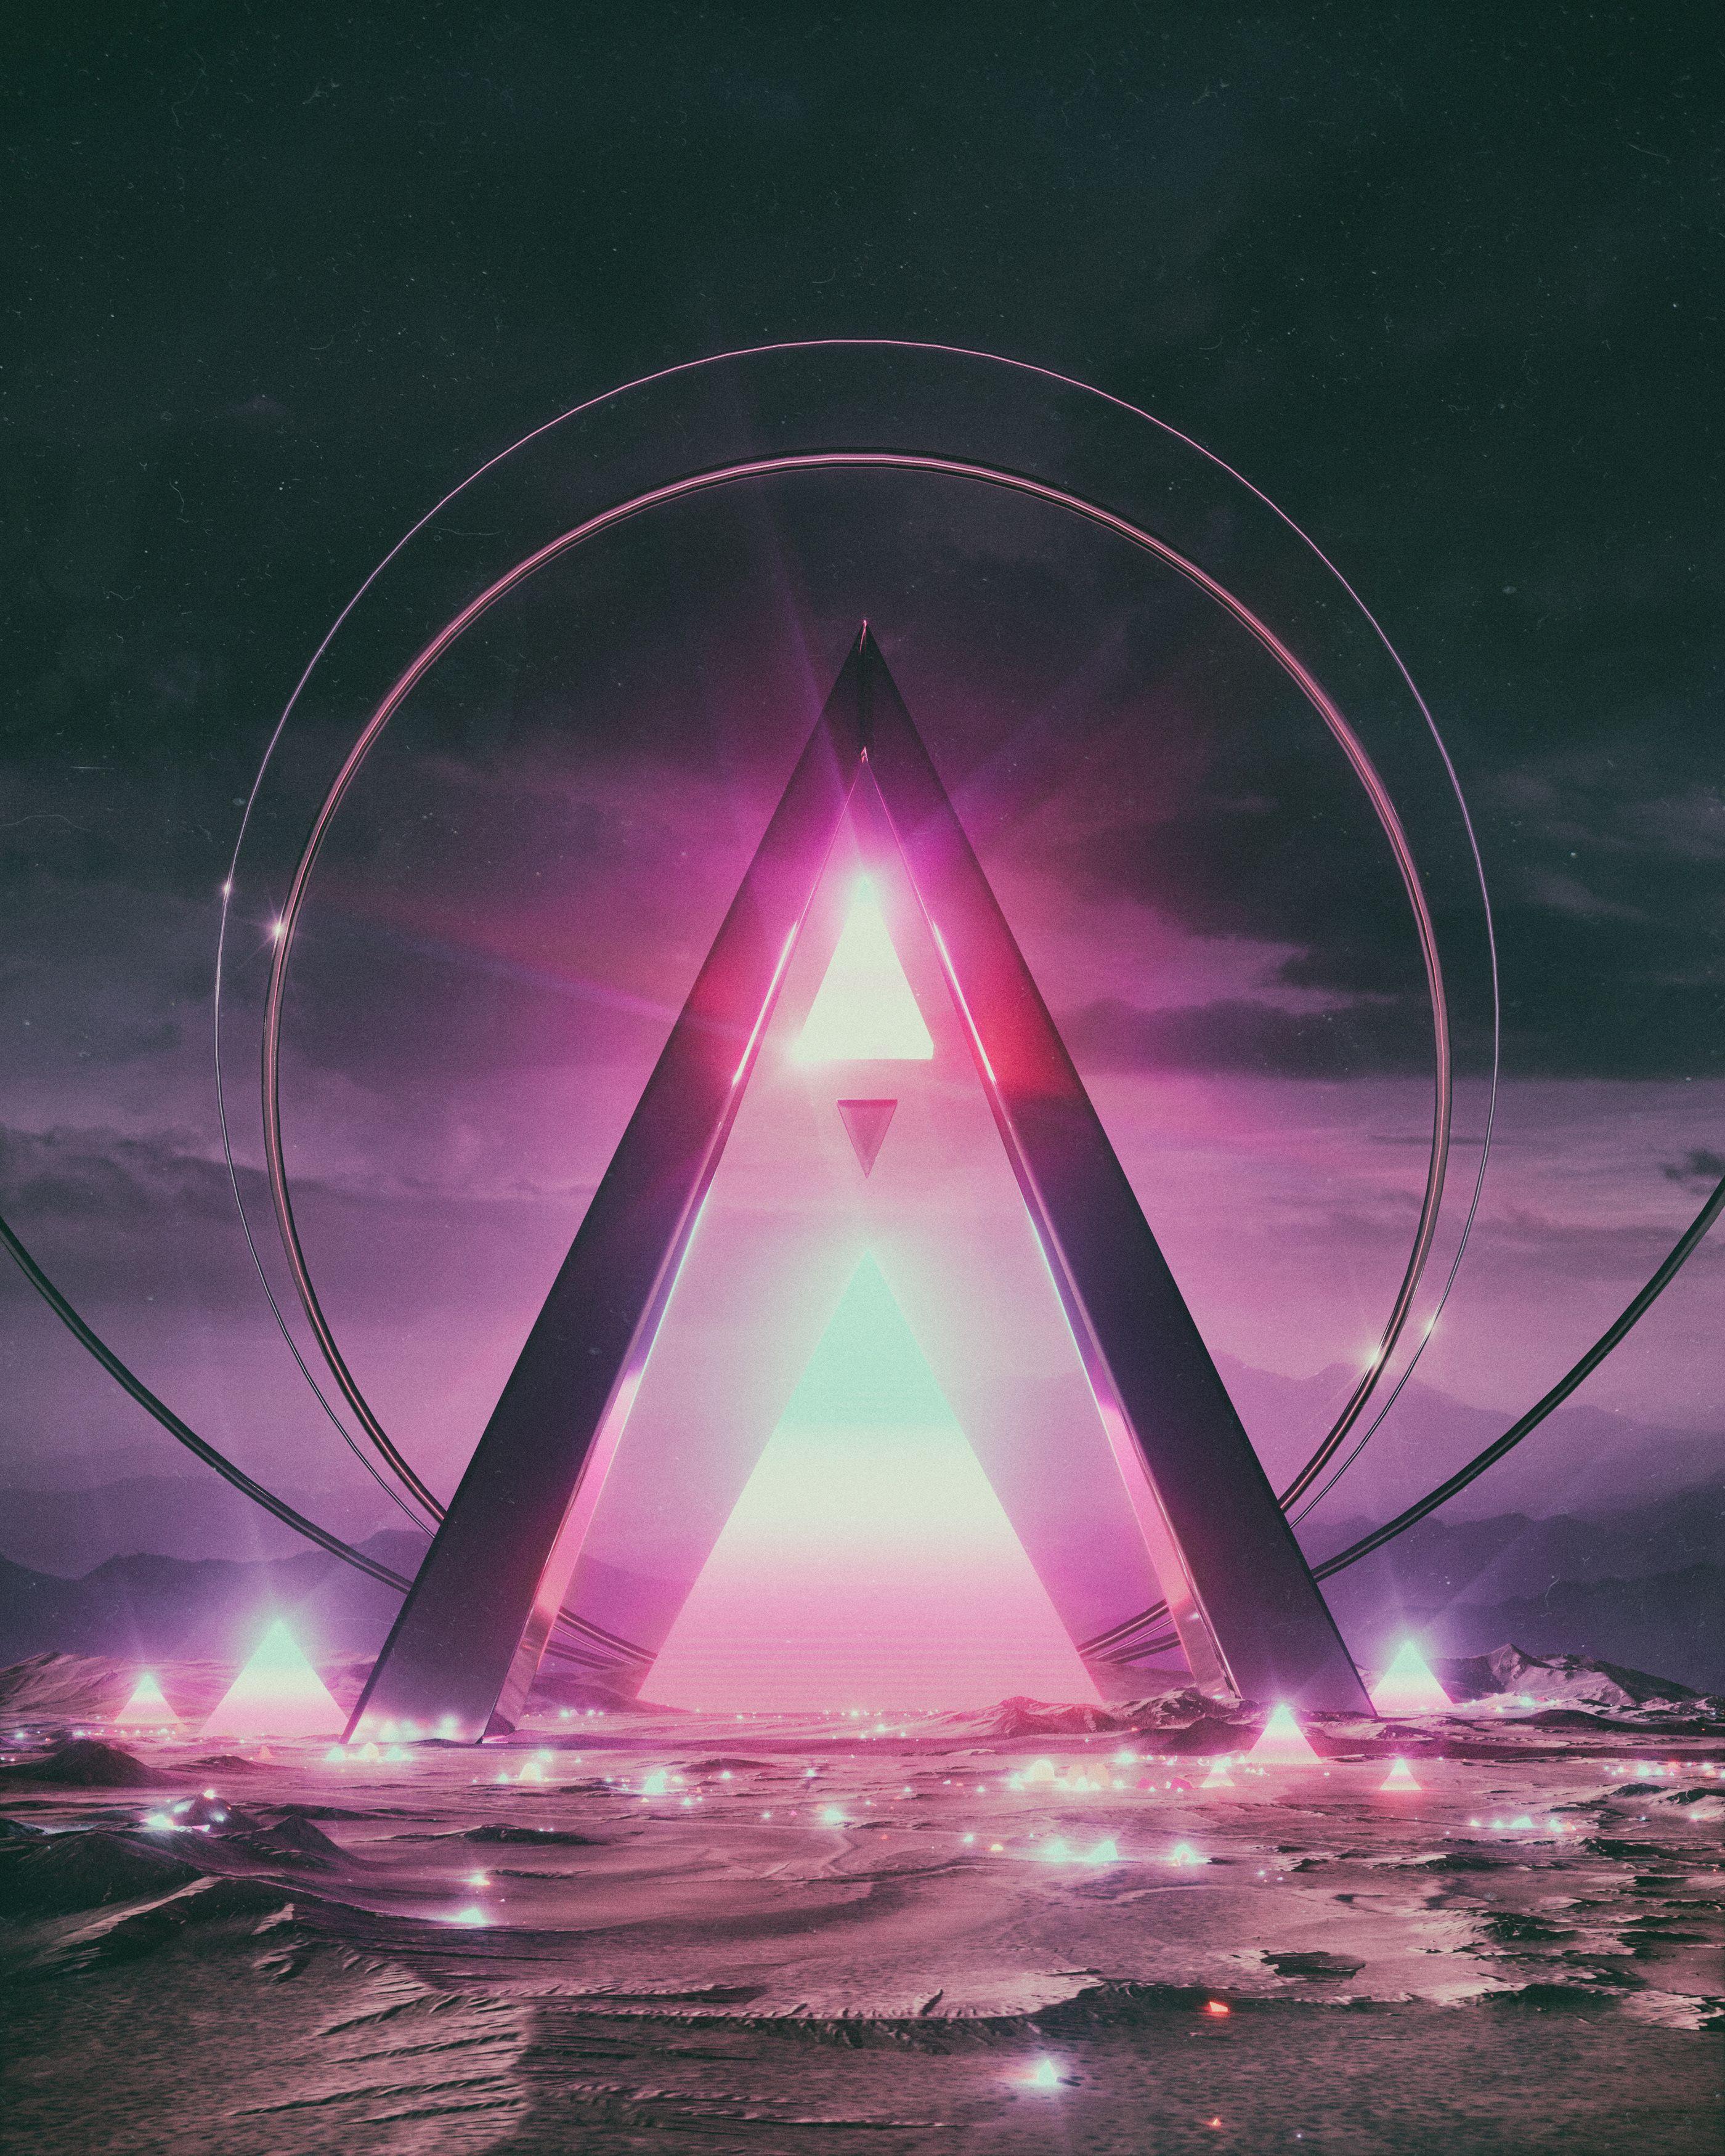 Behance 为您呈现 Vaporwave art, Art, Sci fi concept art